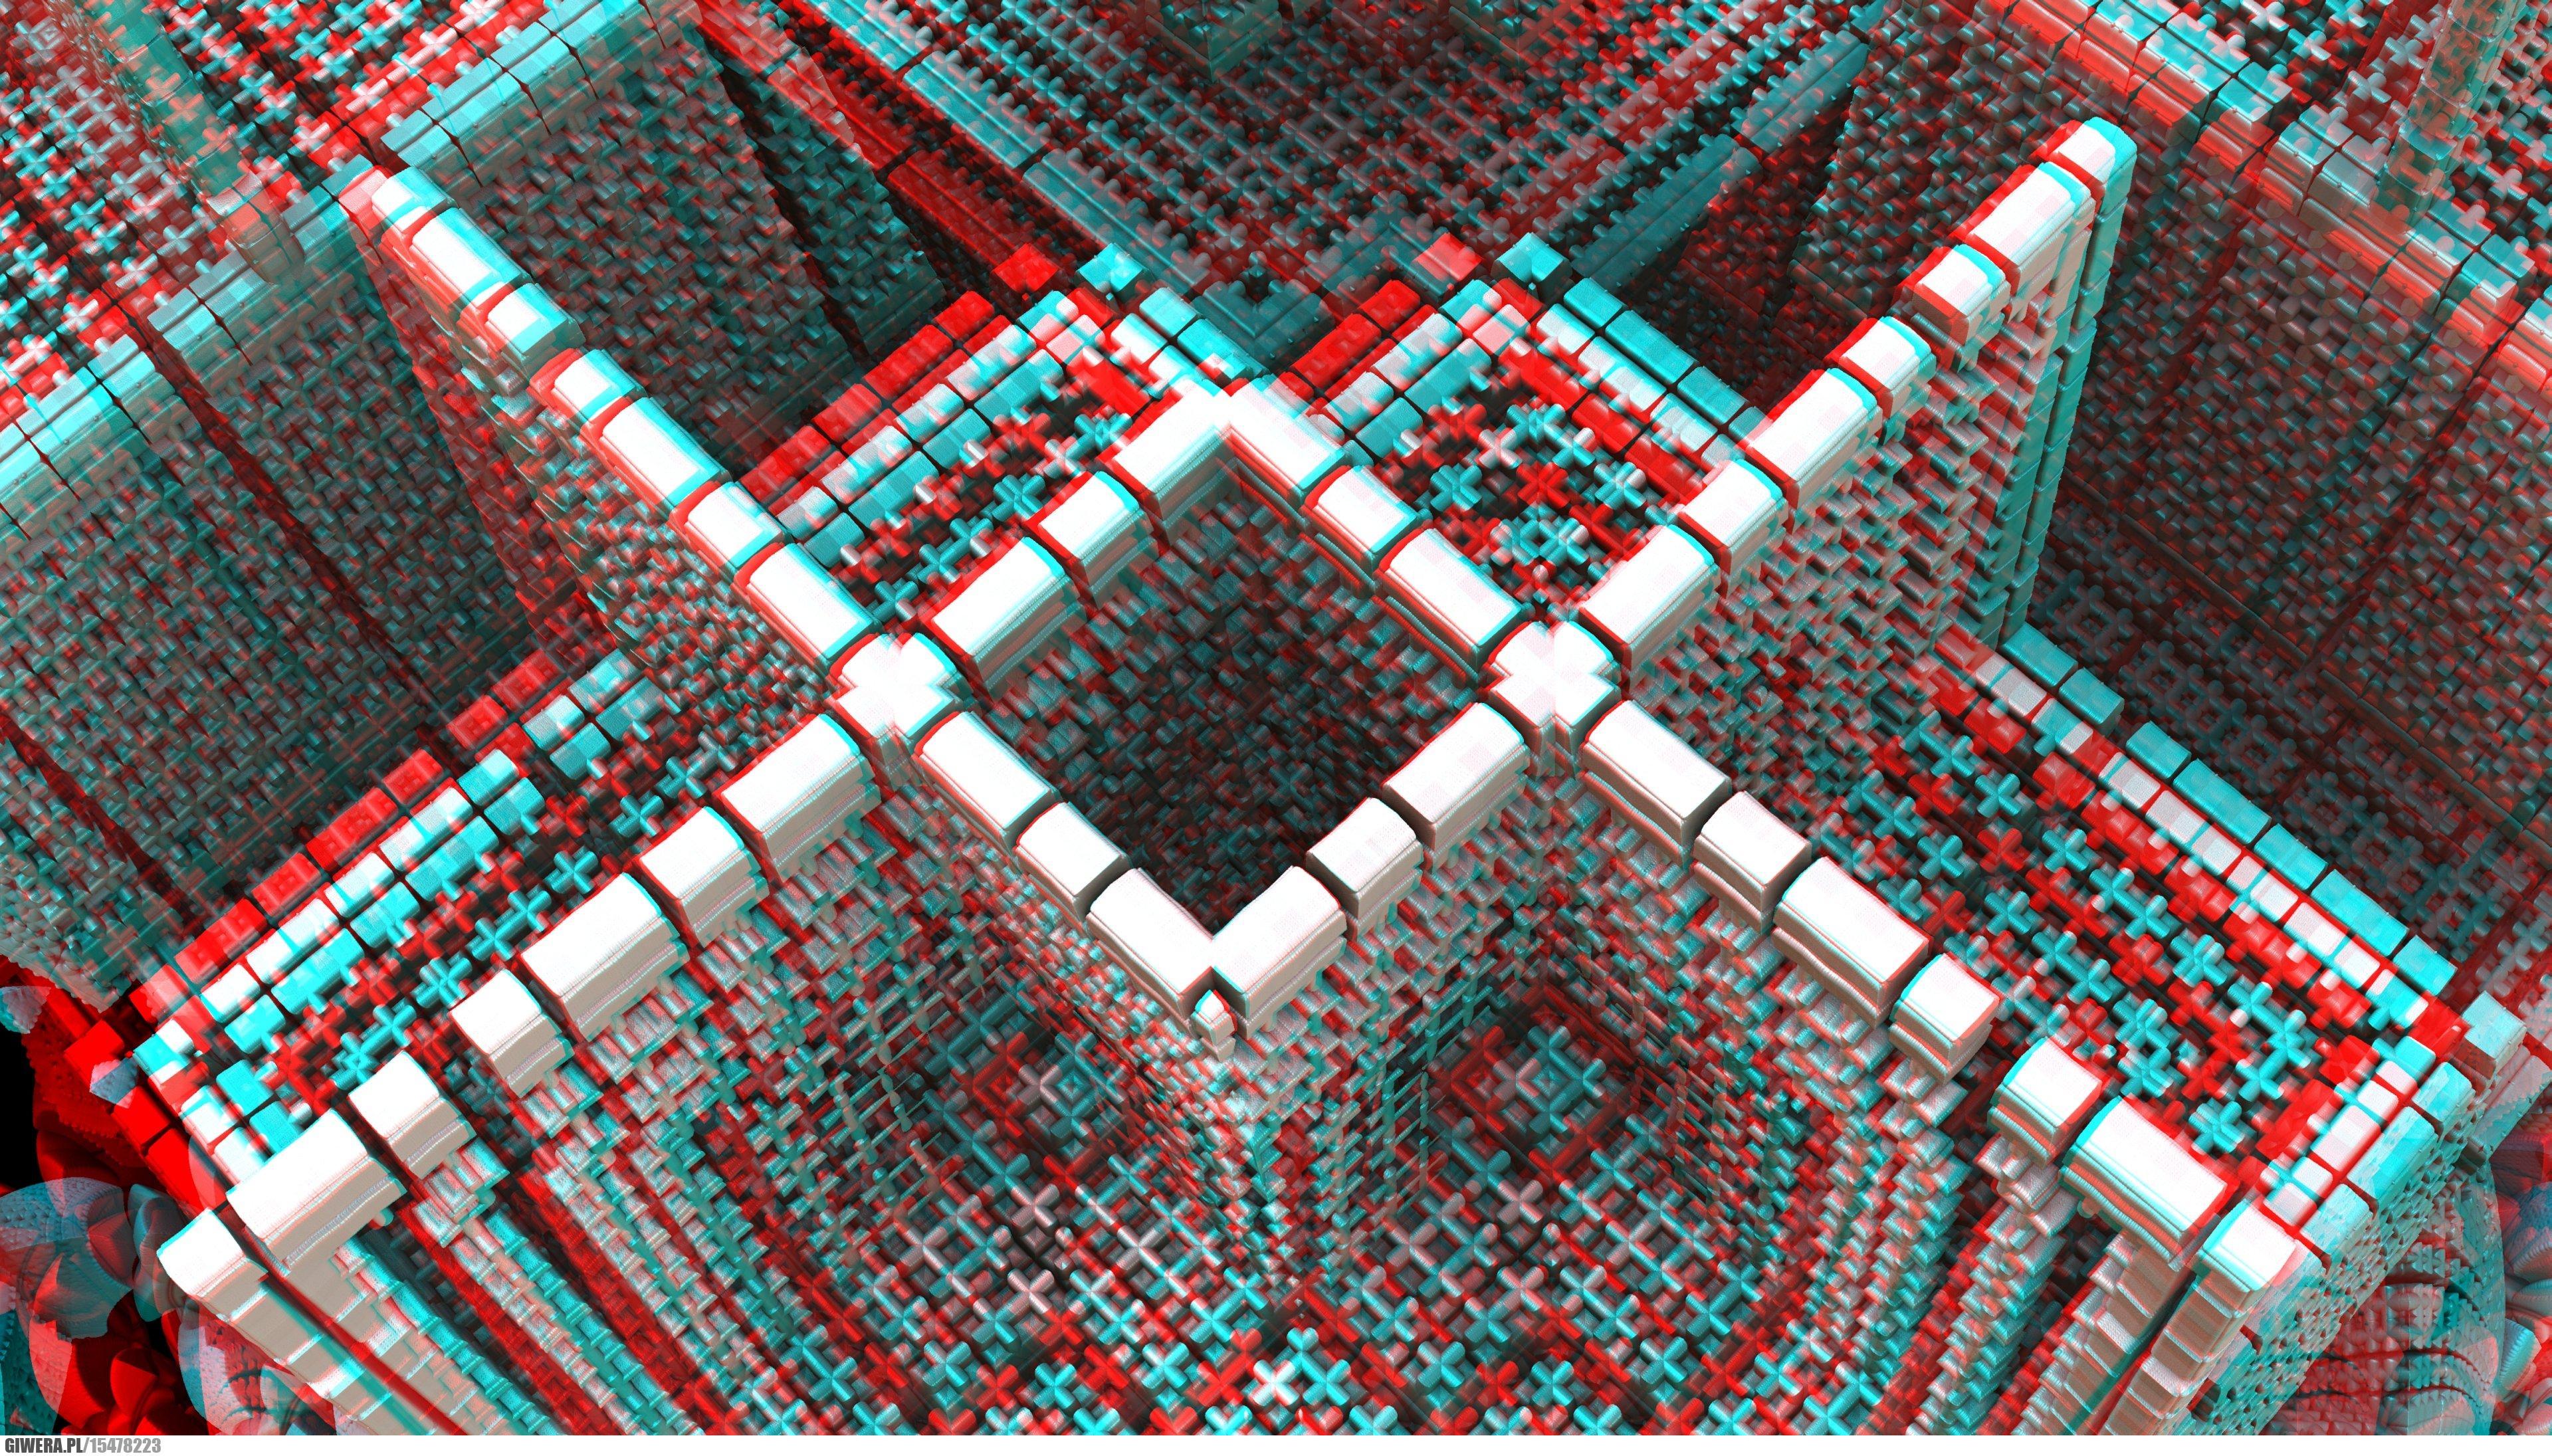 grafika 3d anaglyph red cyan potrzebne okulary 3d. Black Bedroom Furniture Sets. Home Design Ideas